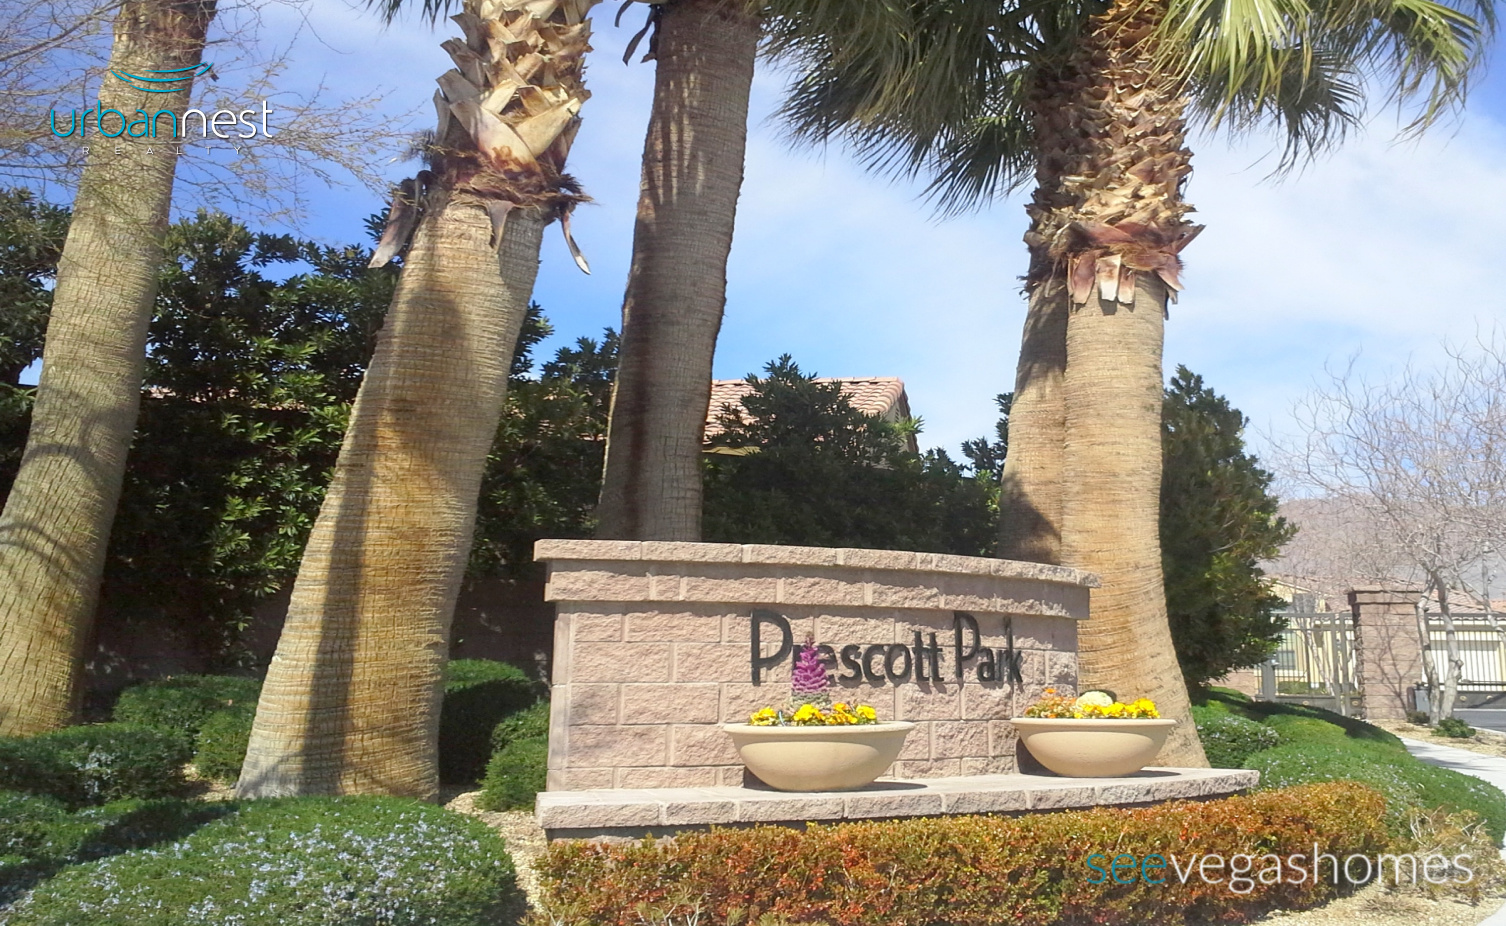 Prescott_Park_North_Las_Vegas_89085_SeeVegasHomes